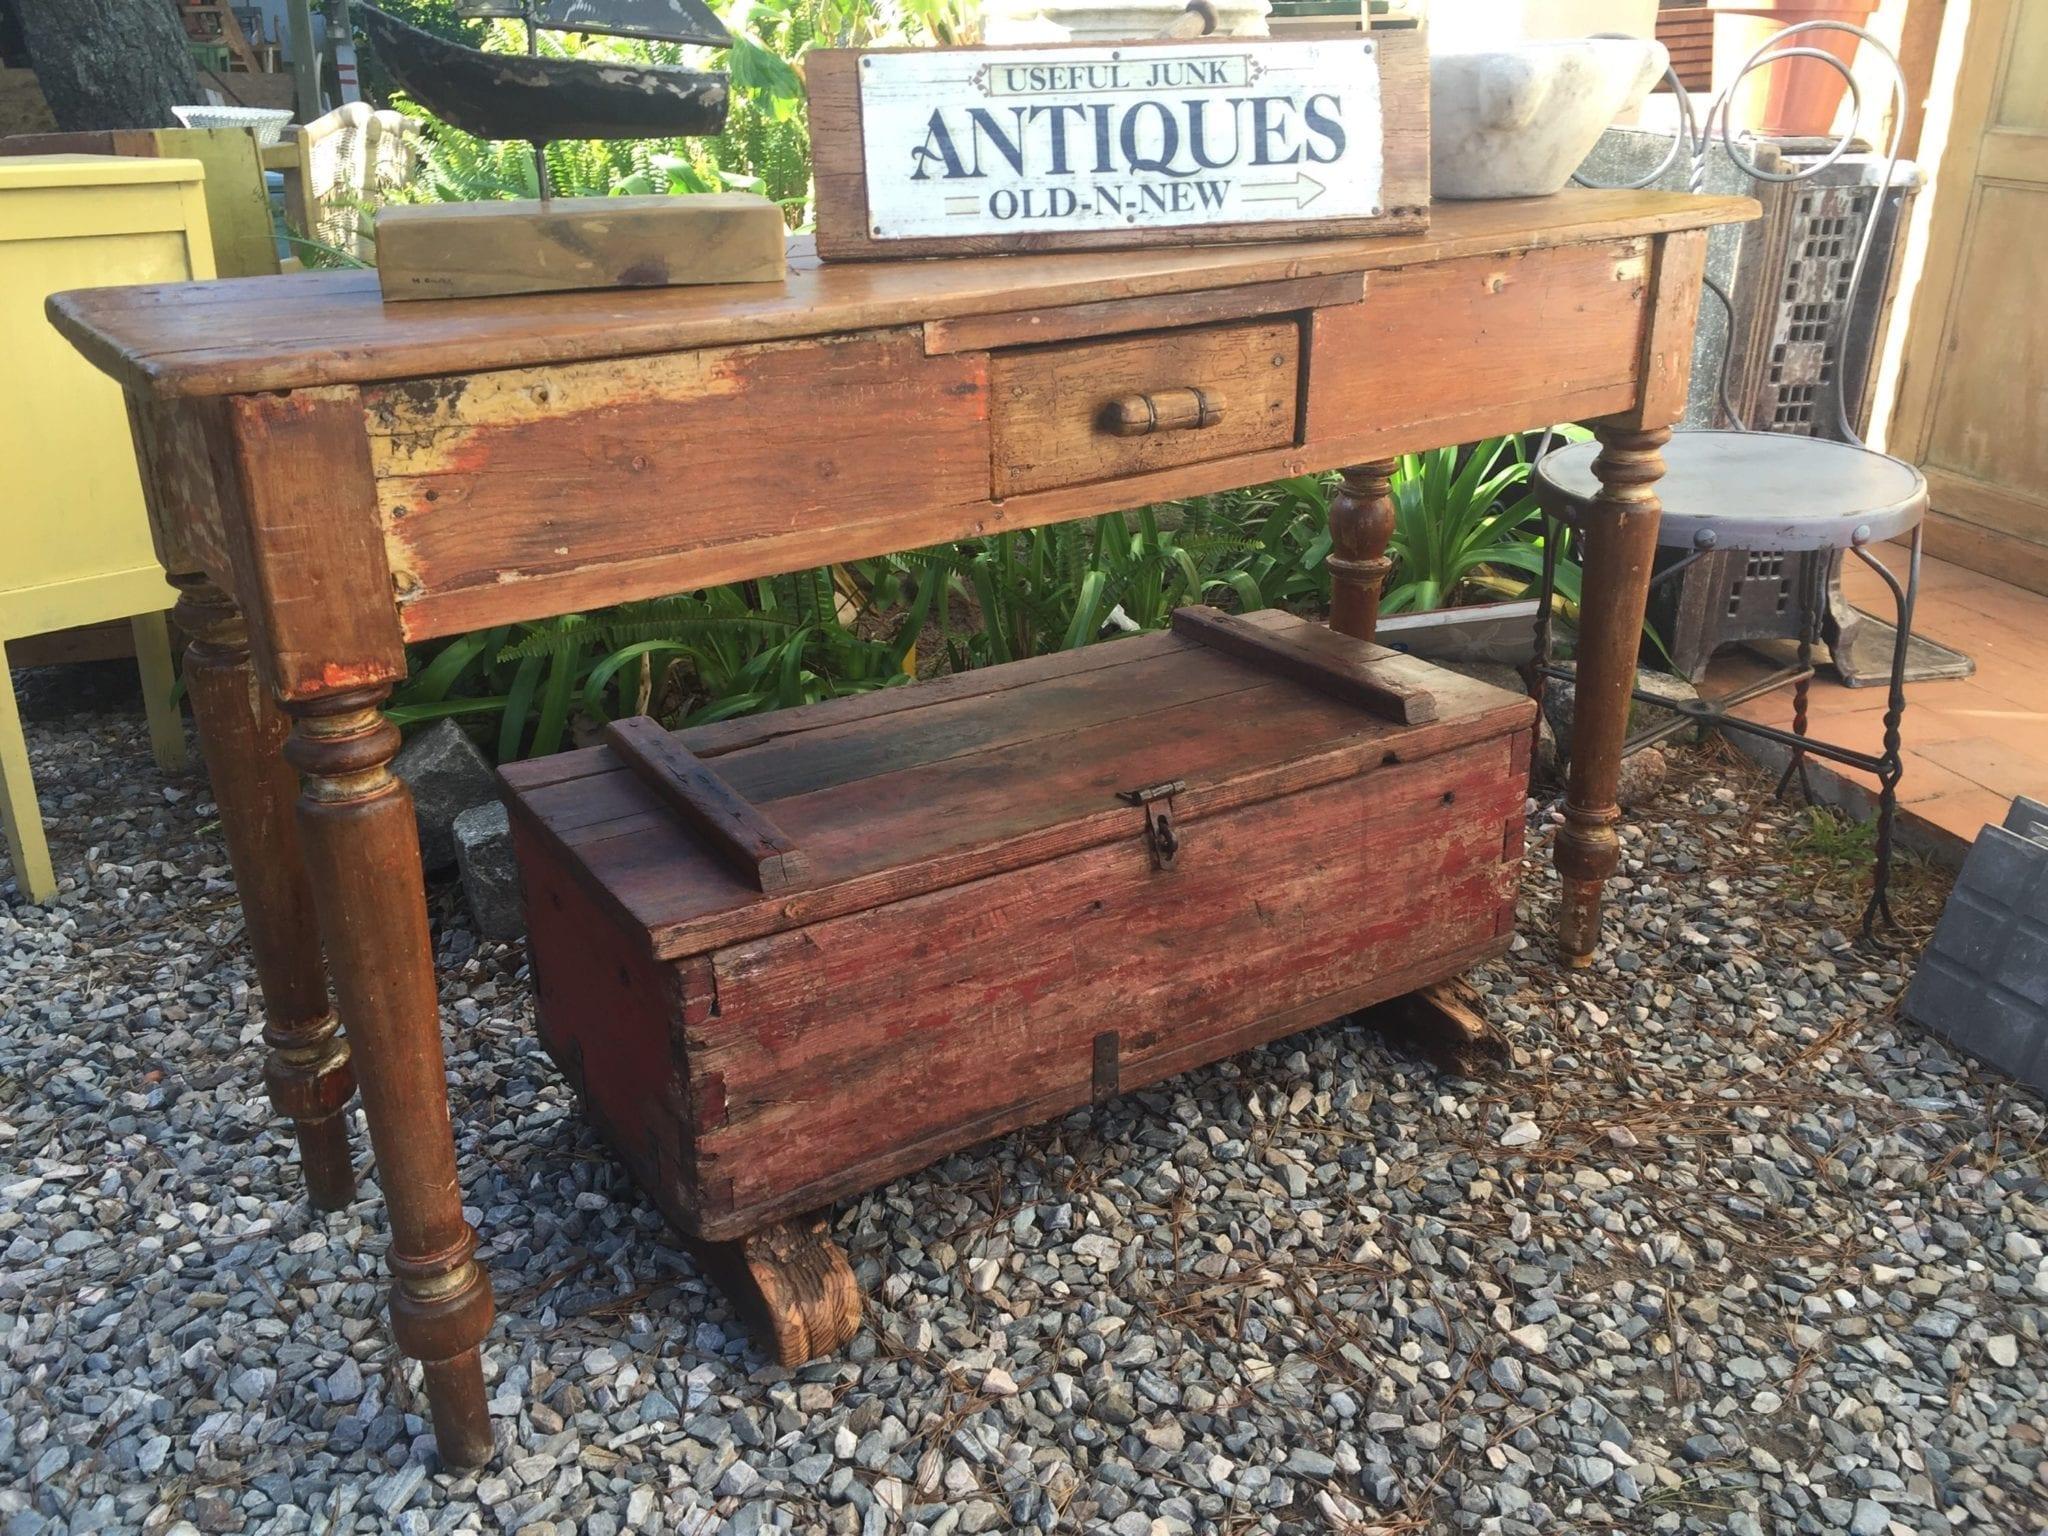 Recuperar muebles viejos ideas fabulosas para restaurar - Recuperar muebles viejos ...